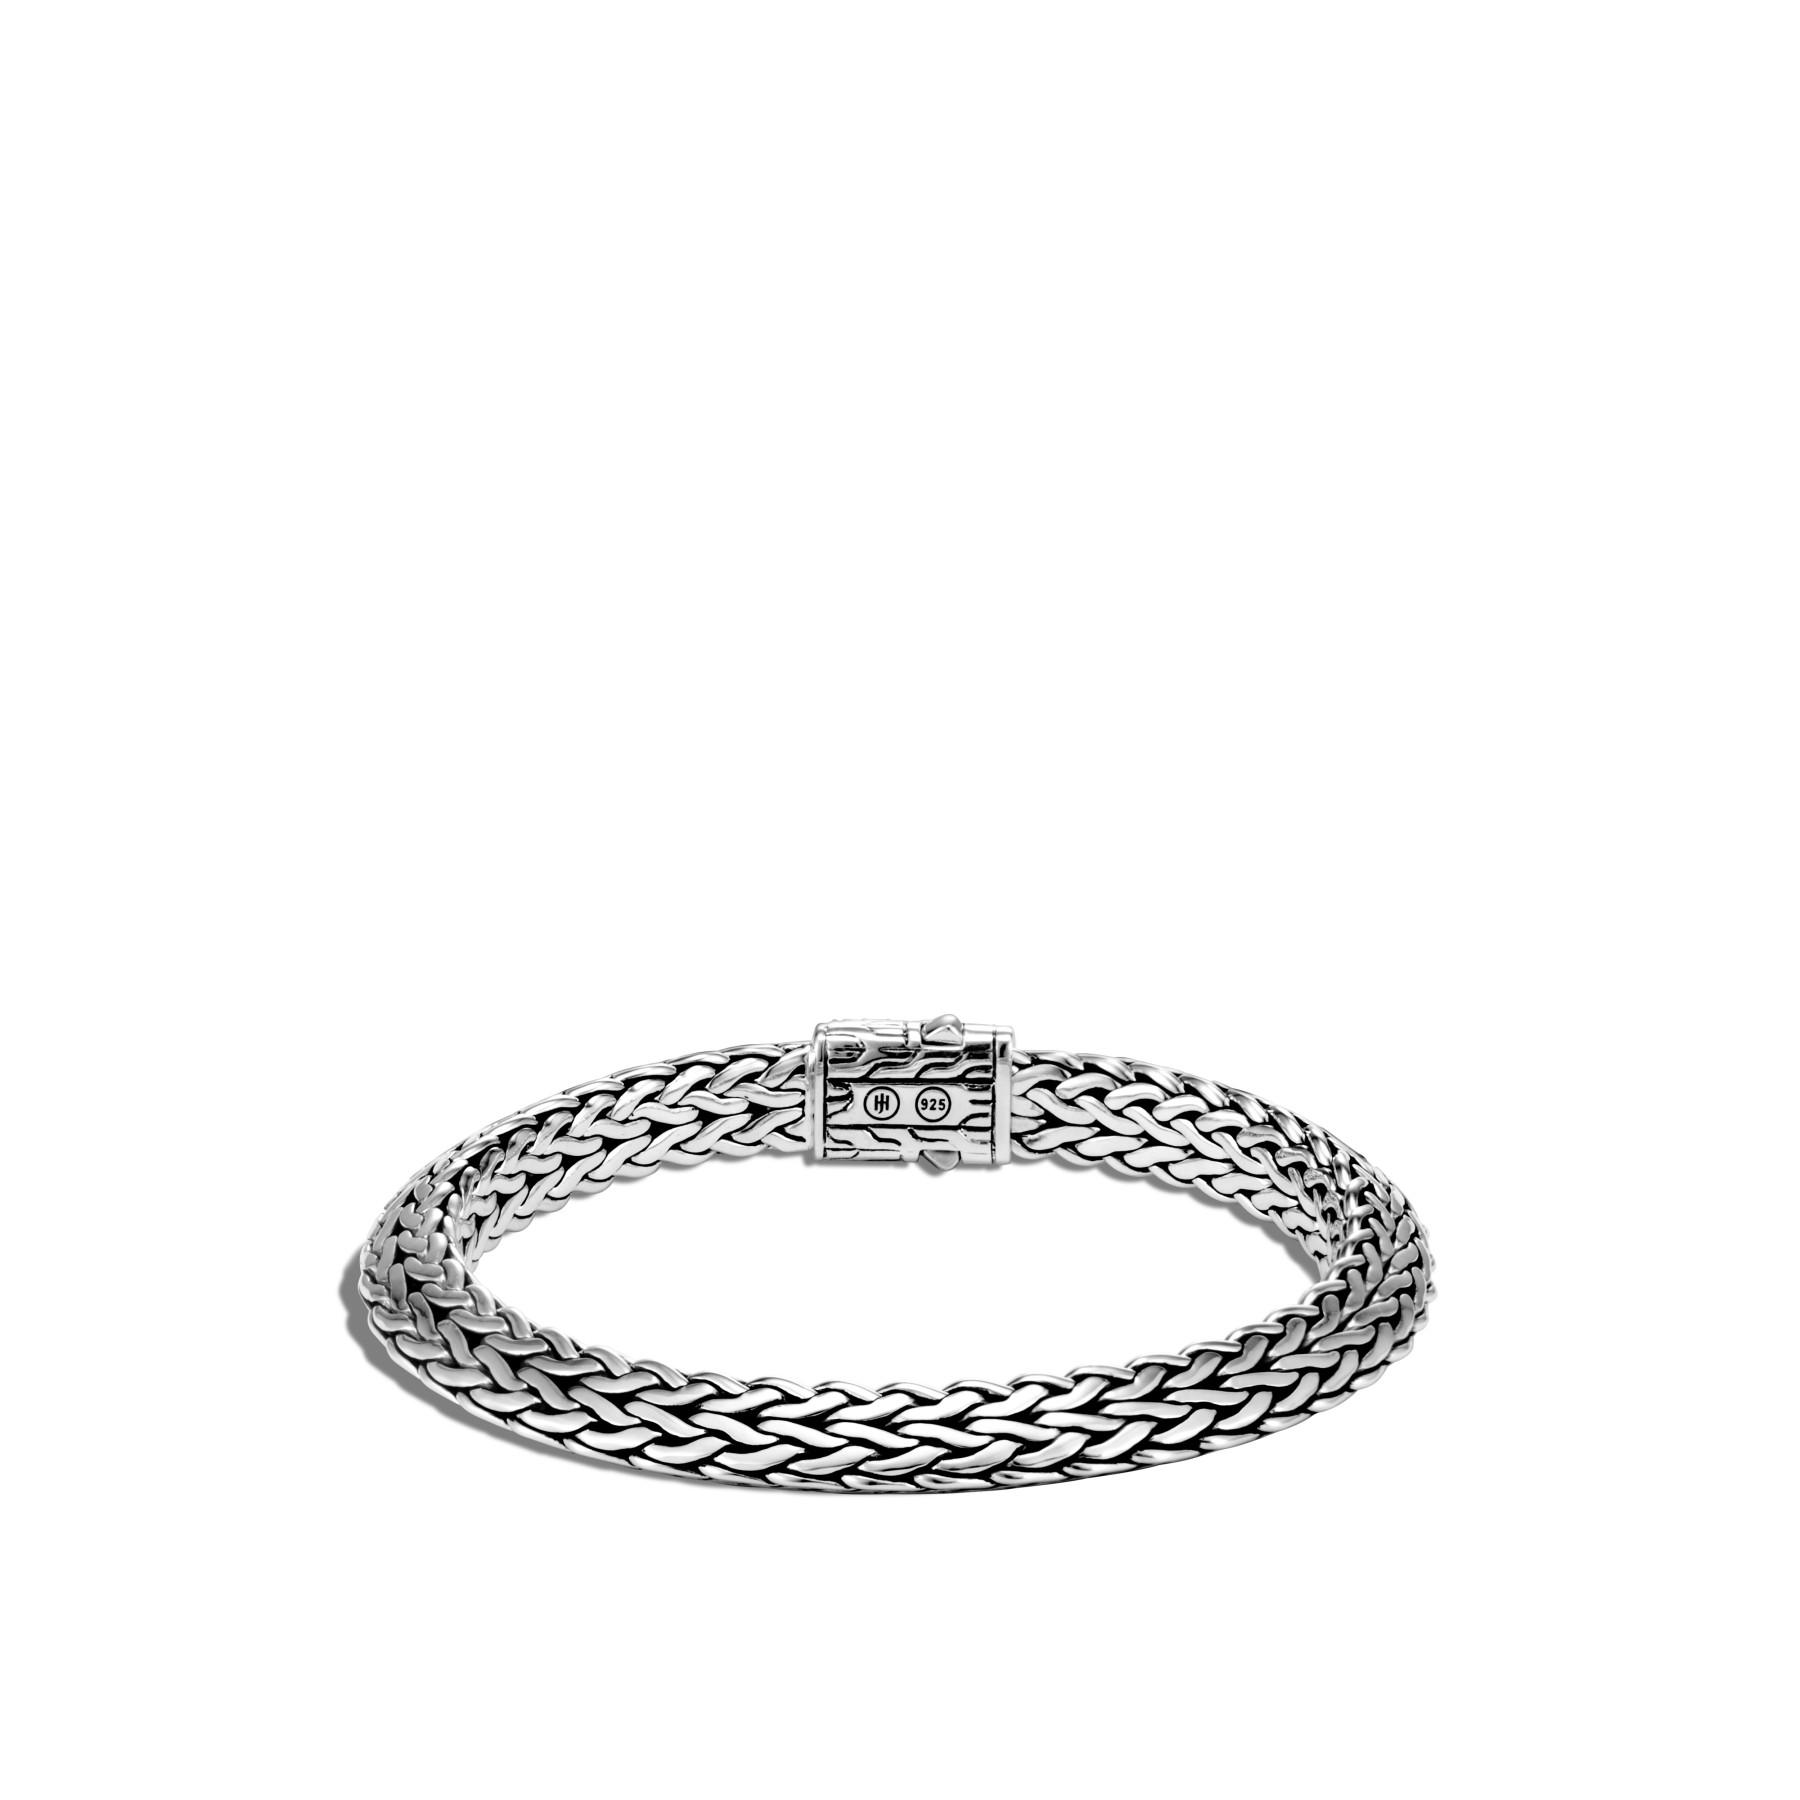 John Hardy Classic Chain Silver Black Sapphire Bracelet - 8mm back view